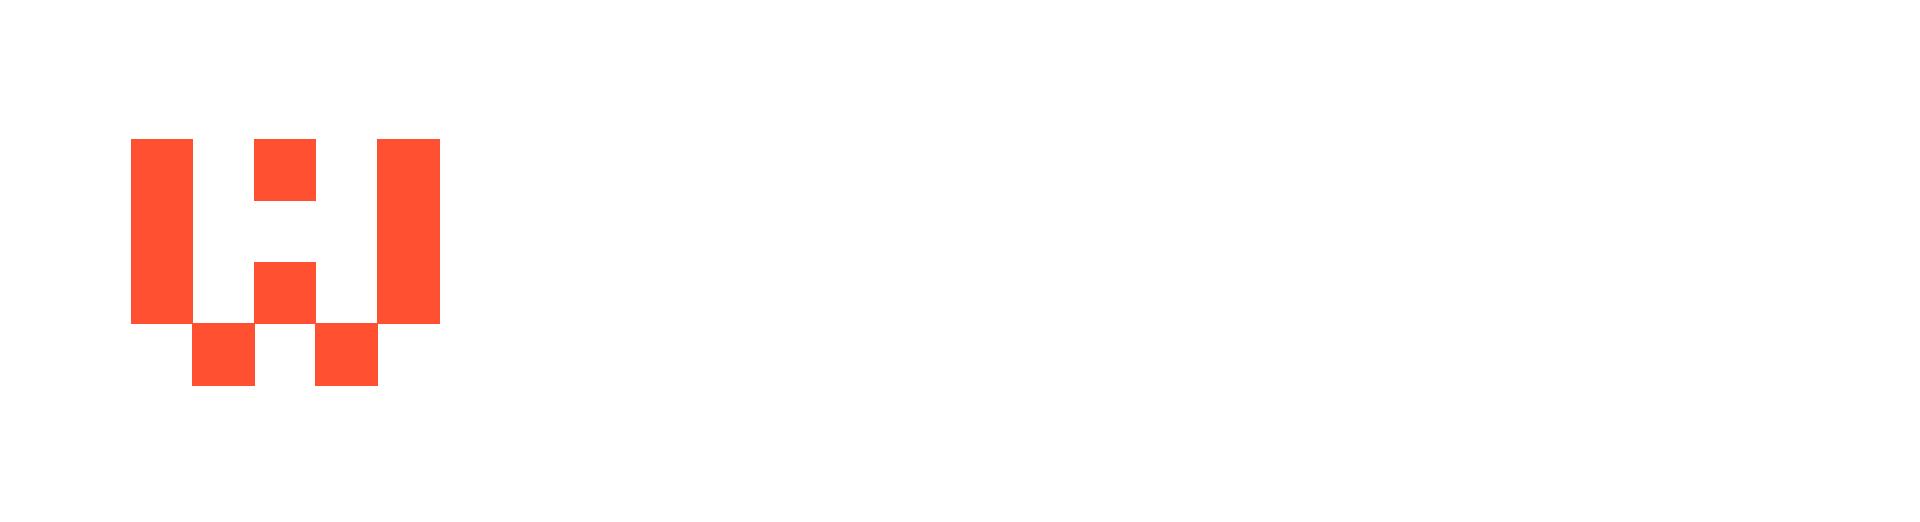 https://cdn2.hubspot.net/hubfs/4835018/hydrawell_logo_lockup_colour.png